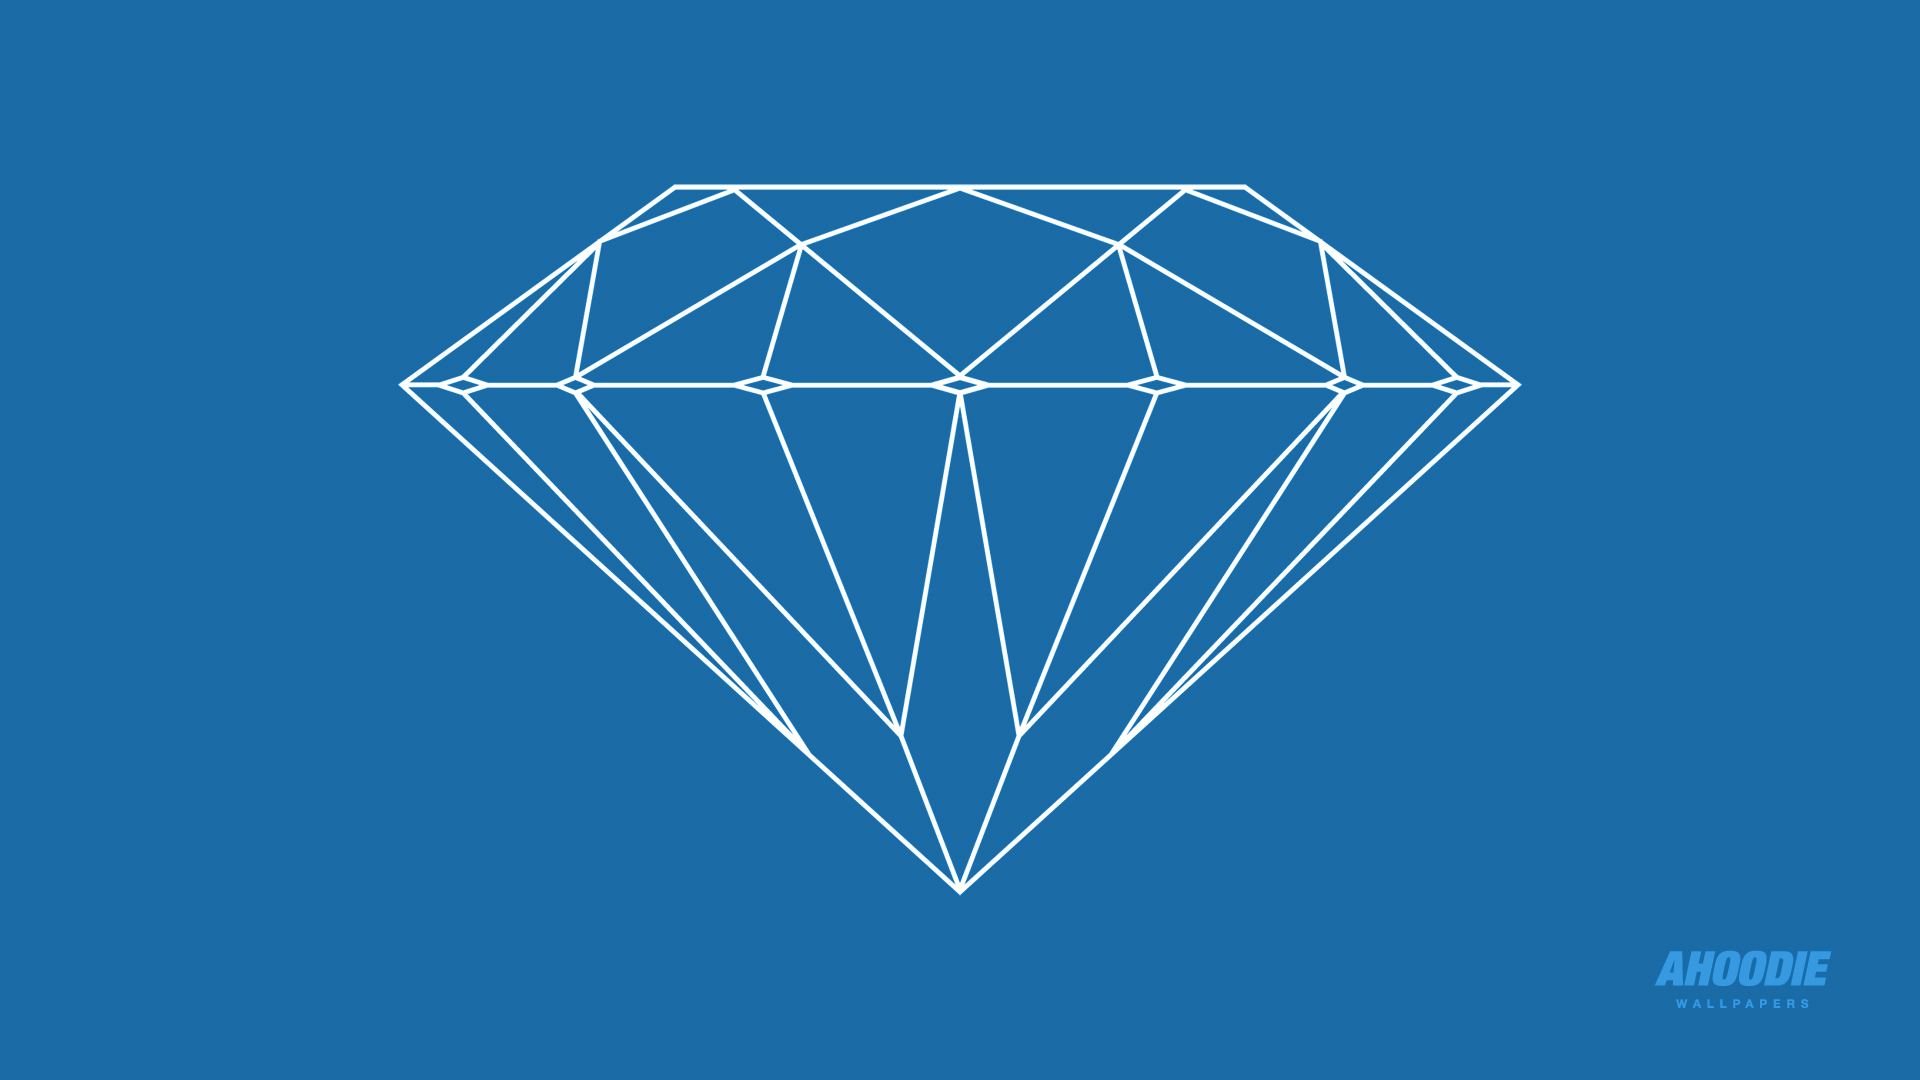 wallpapers diamond suply supply co huf wallpaper diamond supply co 1920x1080